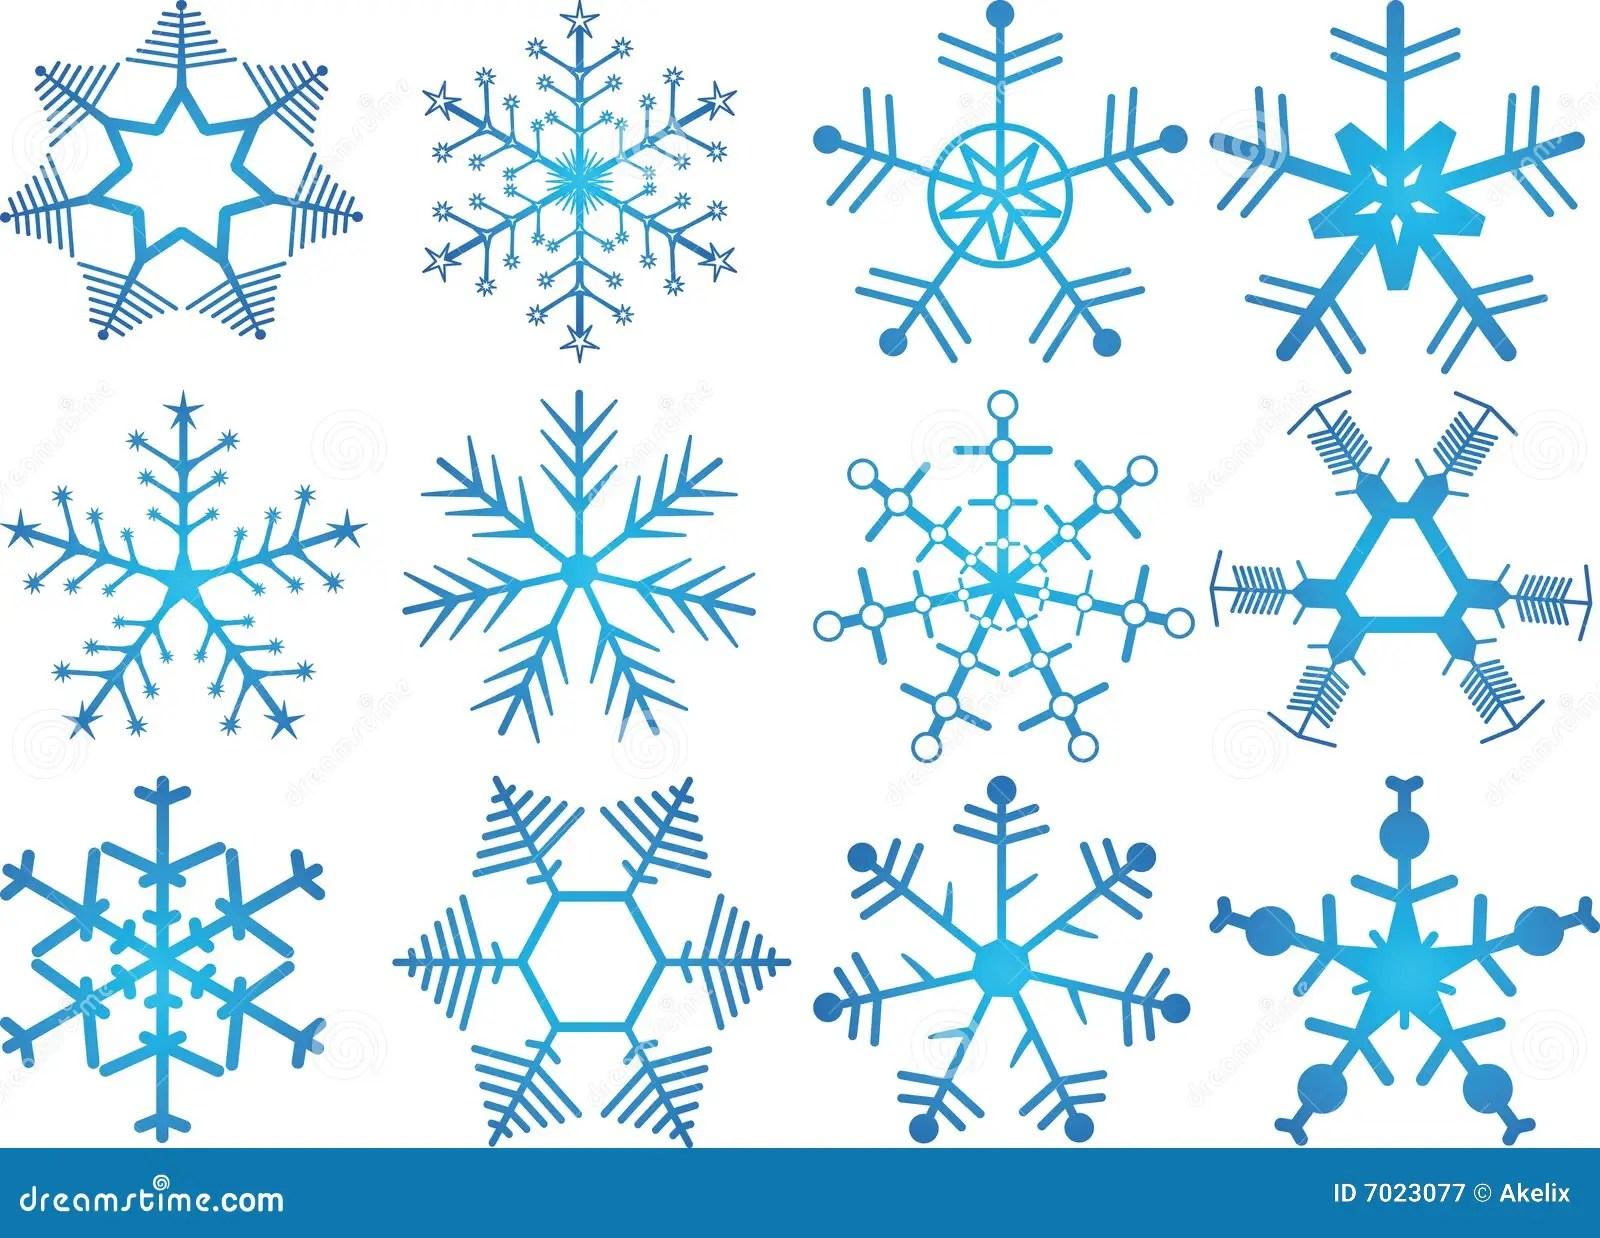 snowflakes vector illustration fully editable easy change